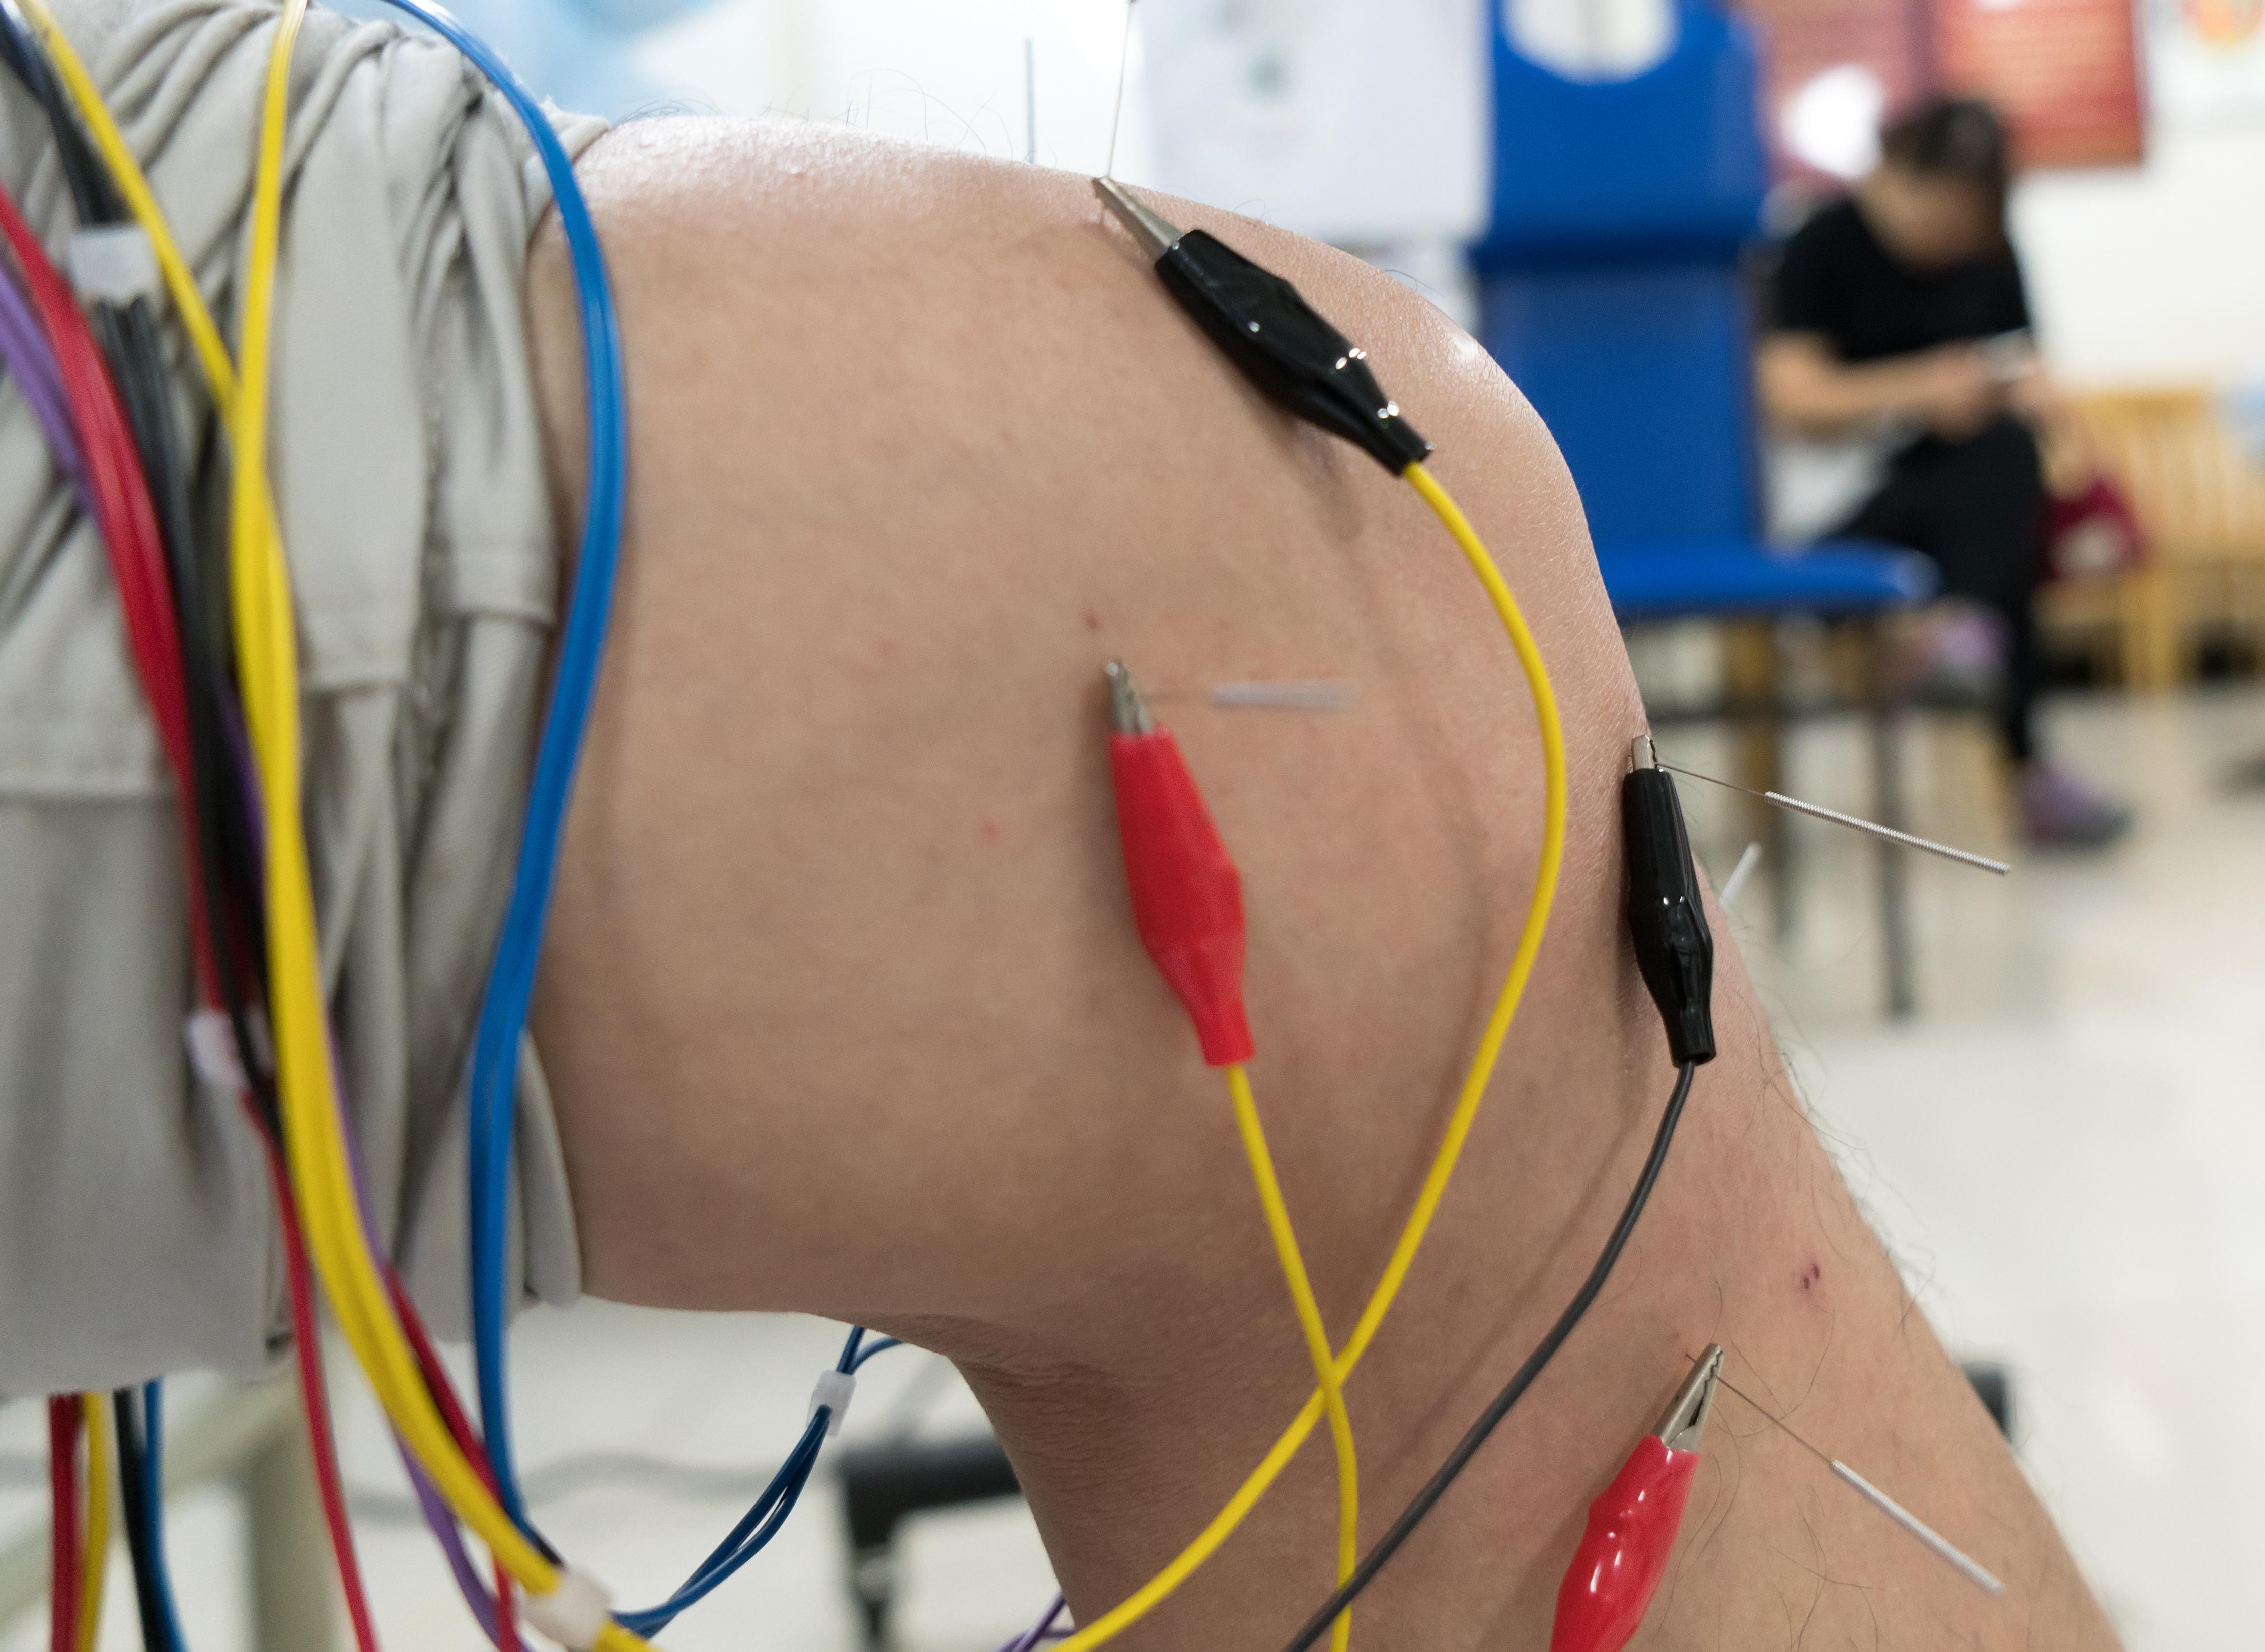 Electro-Stim Acu-Therapy